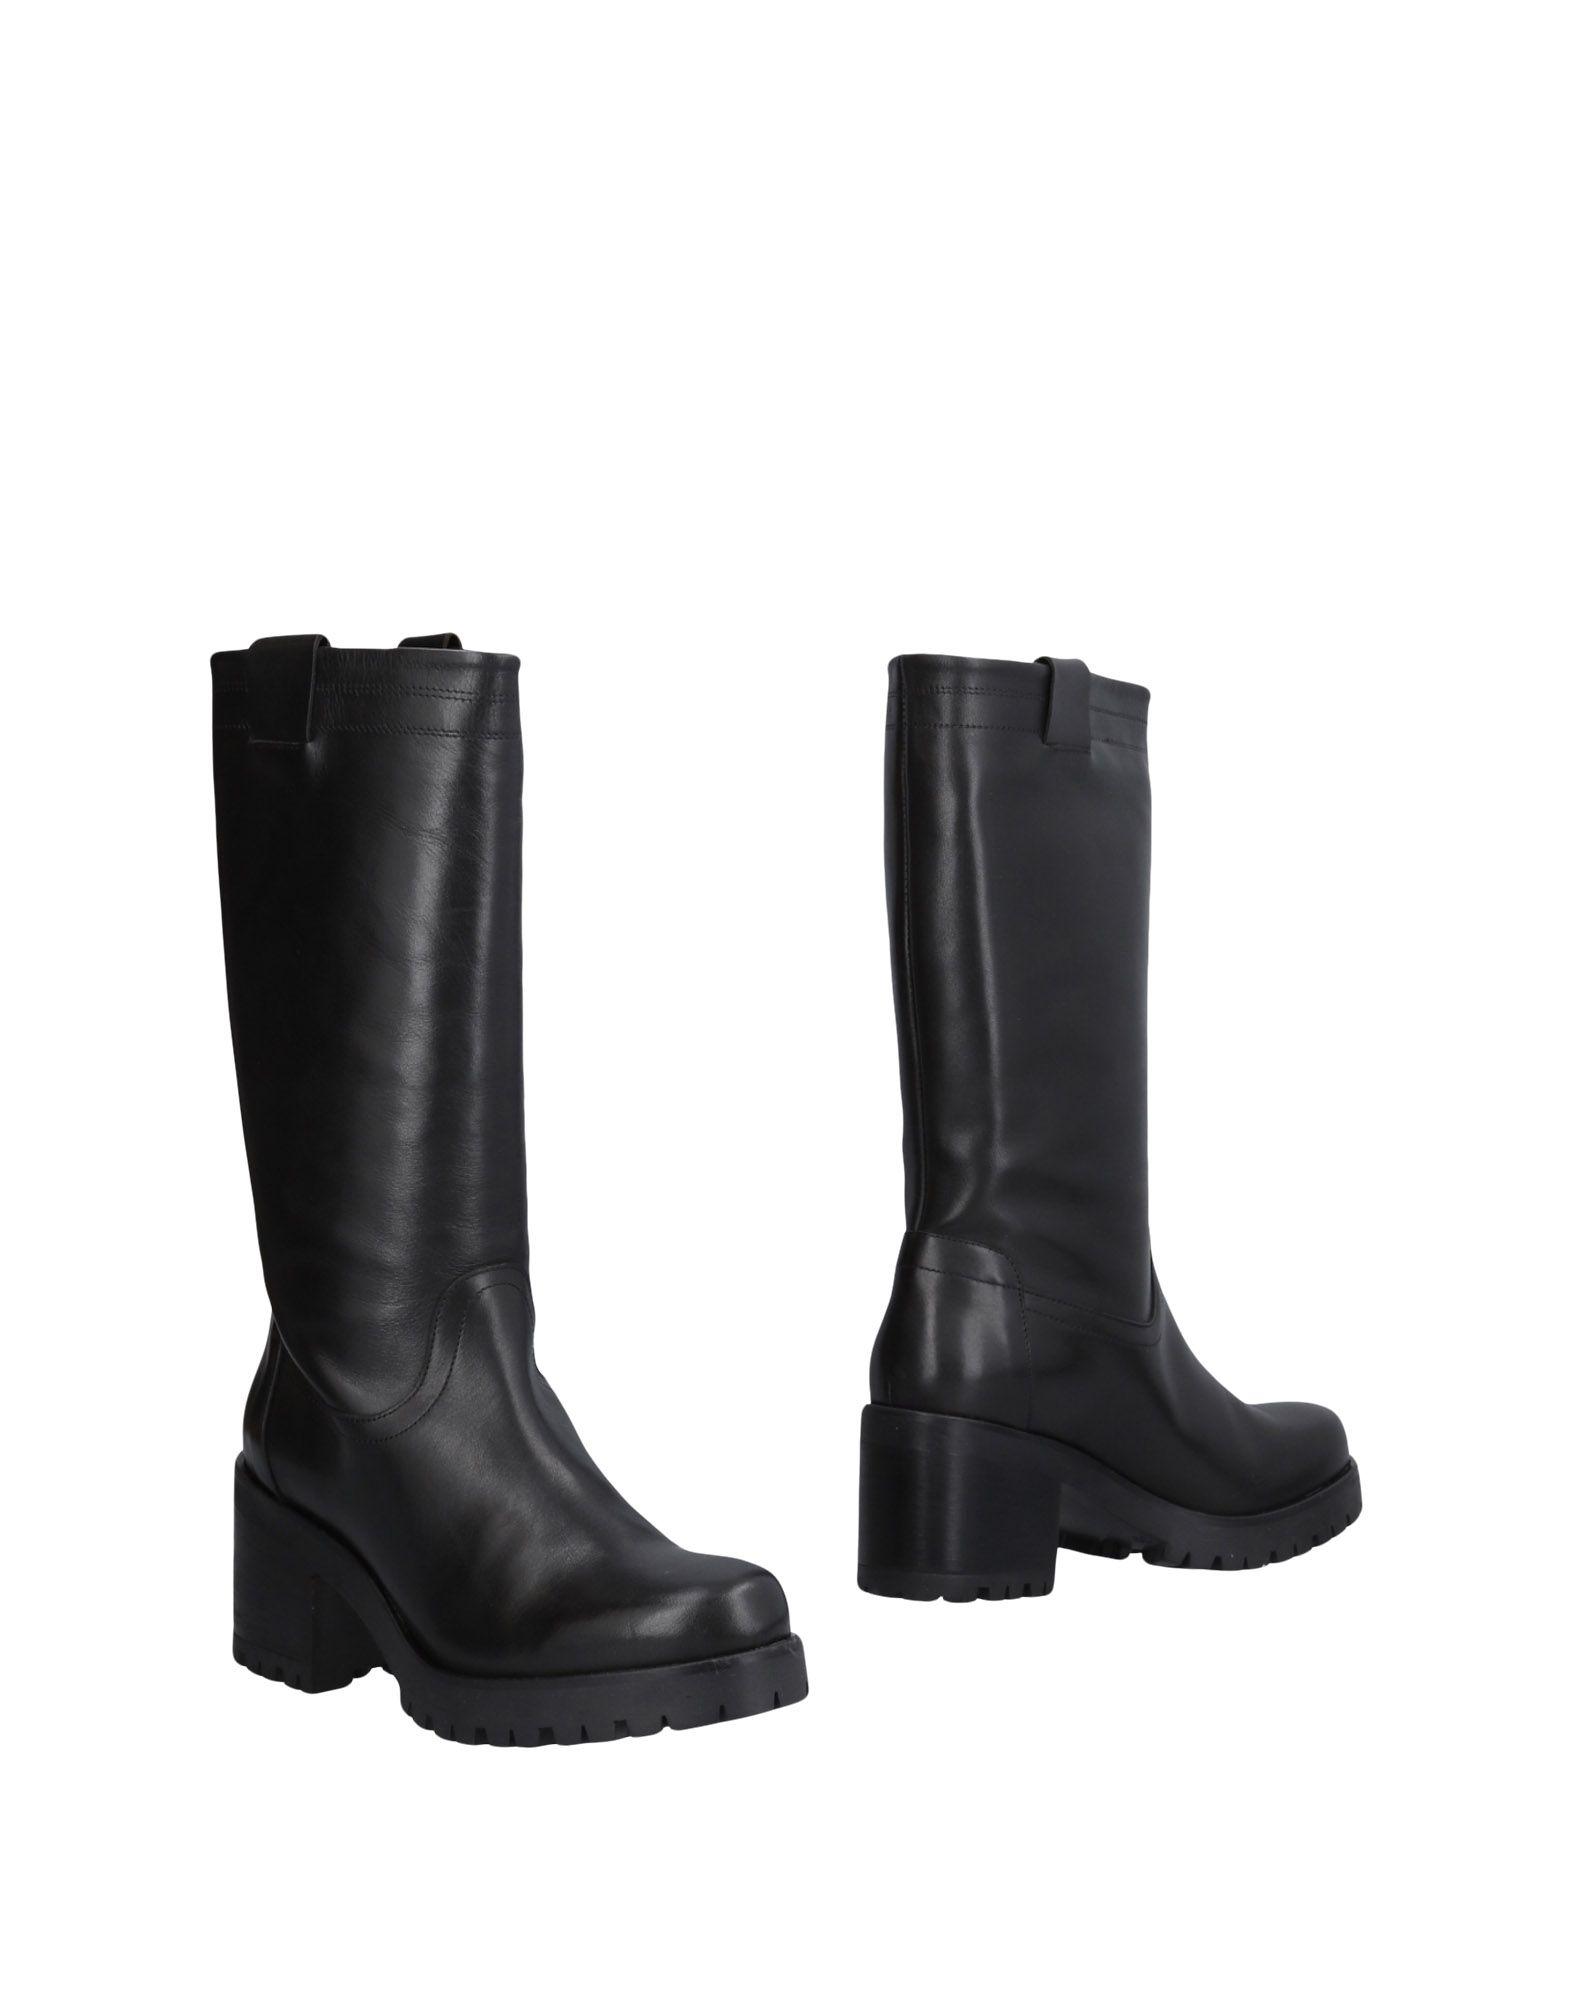 Moda Stivali Stivali Moda Archyve Donna - 11488451TP 11b553